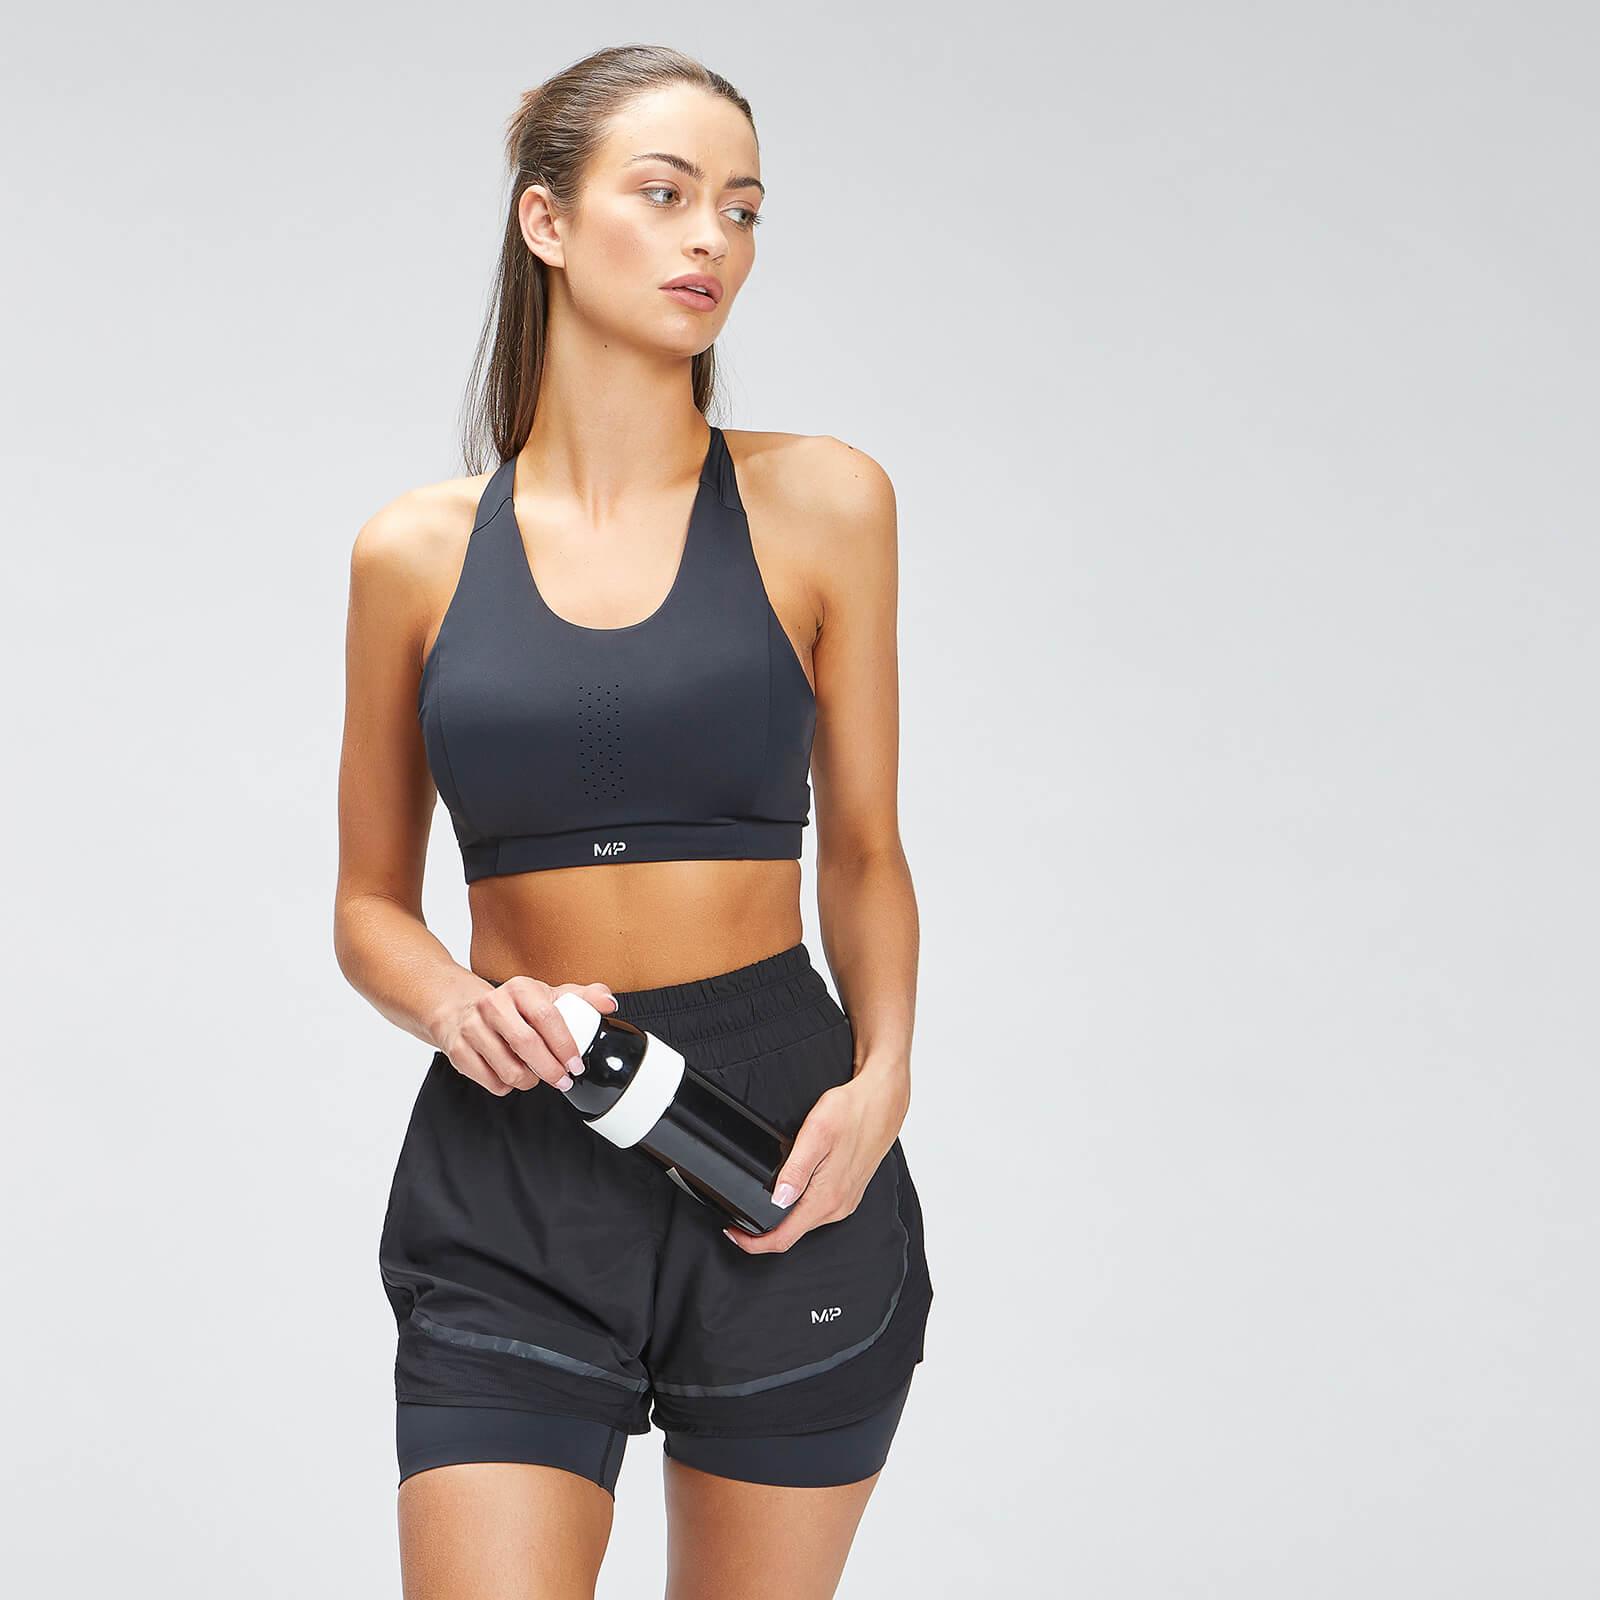 MP Women's Velocity Reflective Sports Bra - Black - XXS, Myprotein International  - купить со скидкой